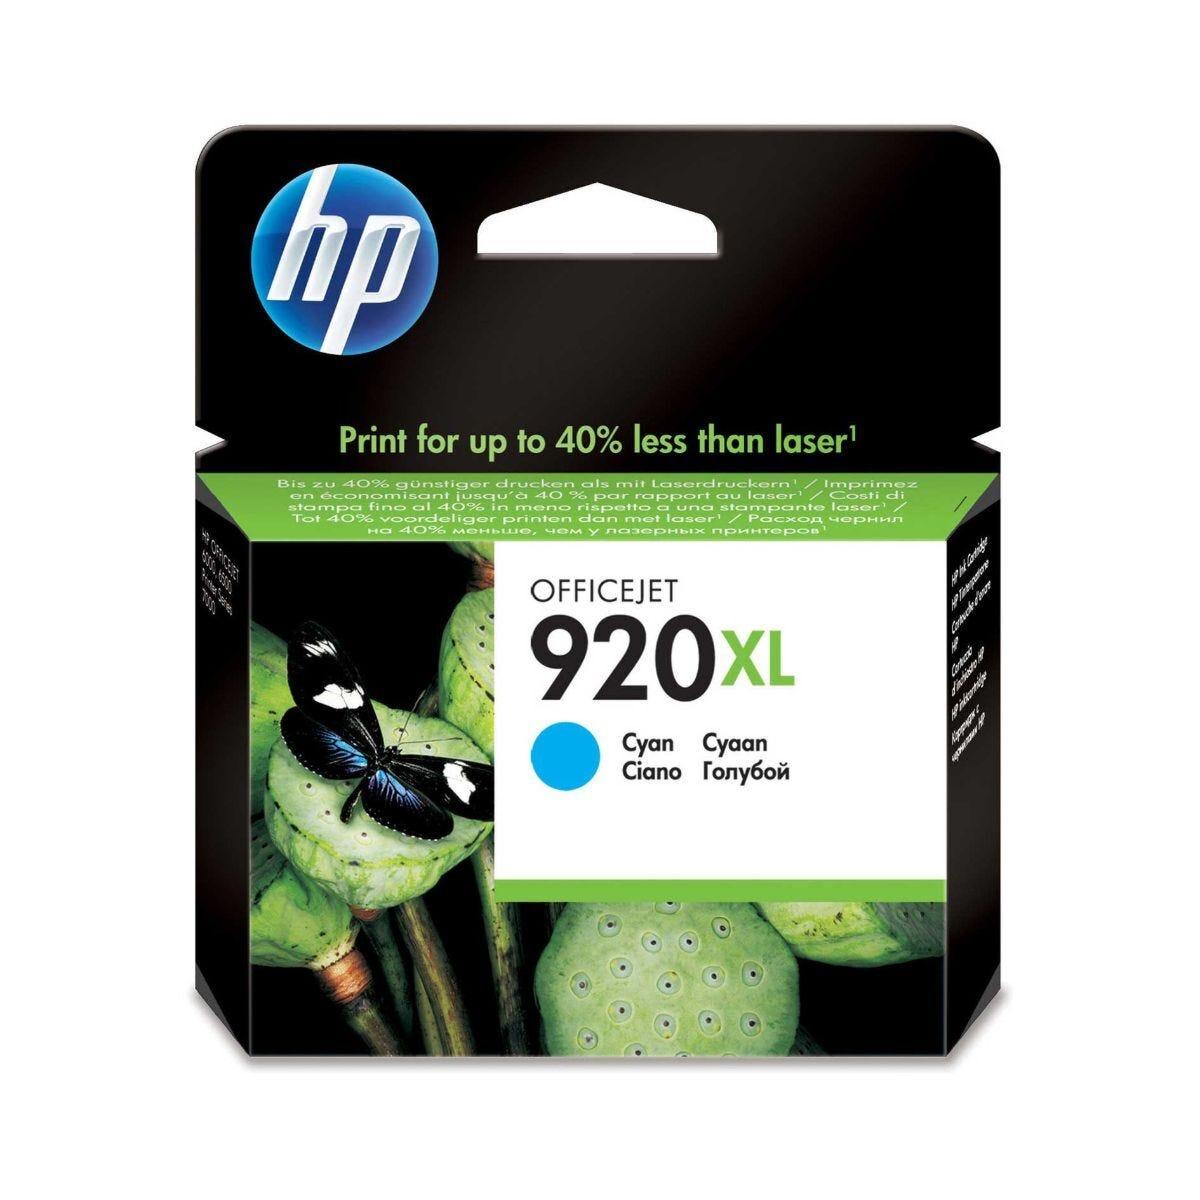 HP 920XL Inkjet Cartridge Cyan